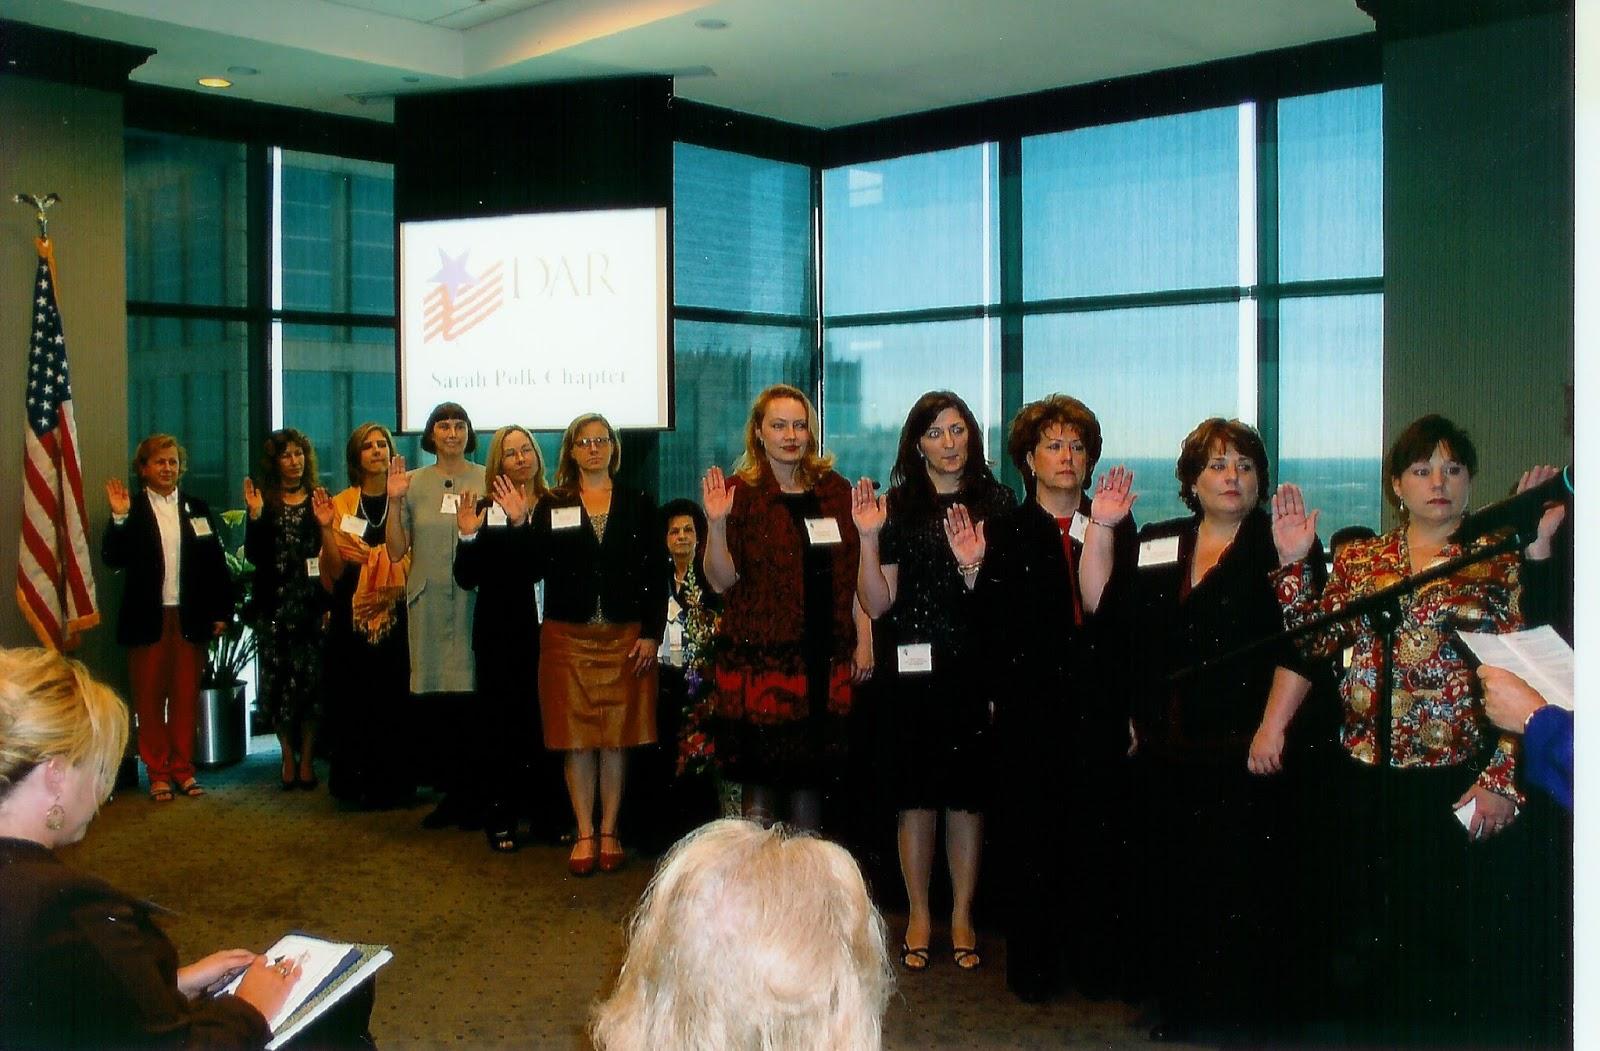 New members initiated at Organizing Meeting